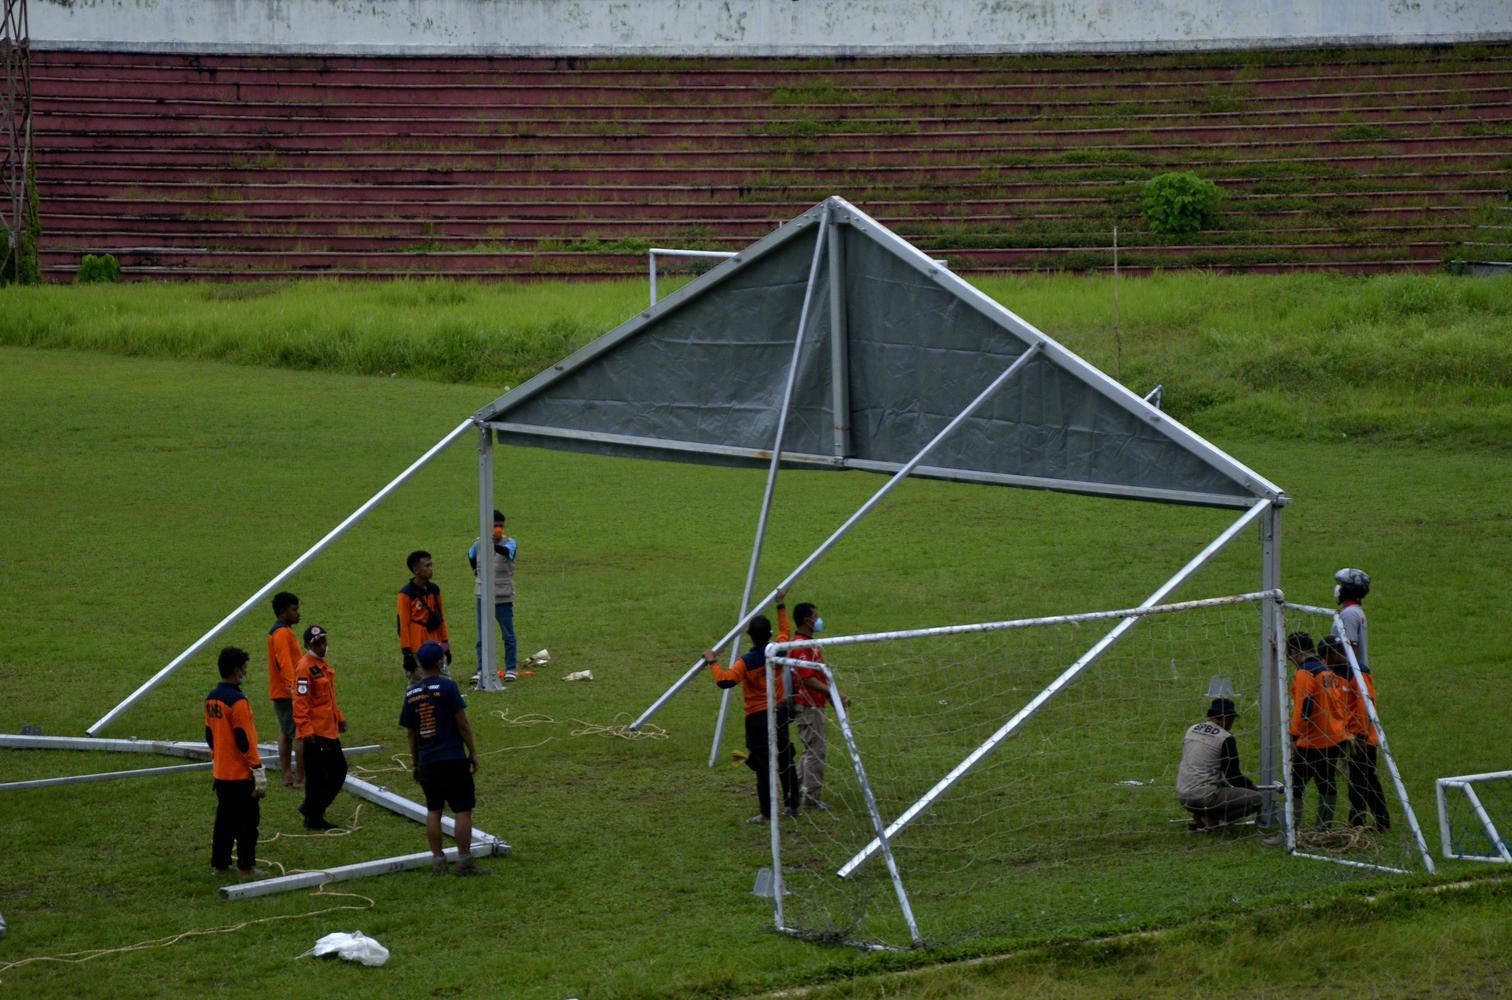 Sejumlah relawan dan tim SAR gabungan mendirikan tenda posko pengungsian untuk warga korban gempa bumi di Stadion Manakkara, Kabupaten Mamuju, Sulawesi Barat, Minggu (17/1/2021).